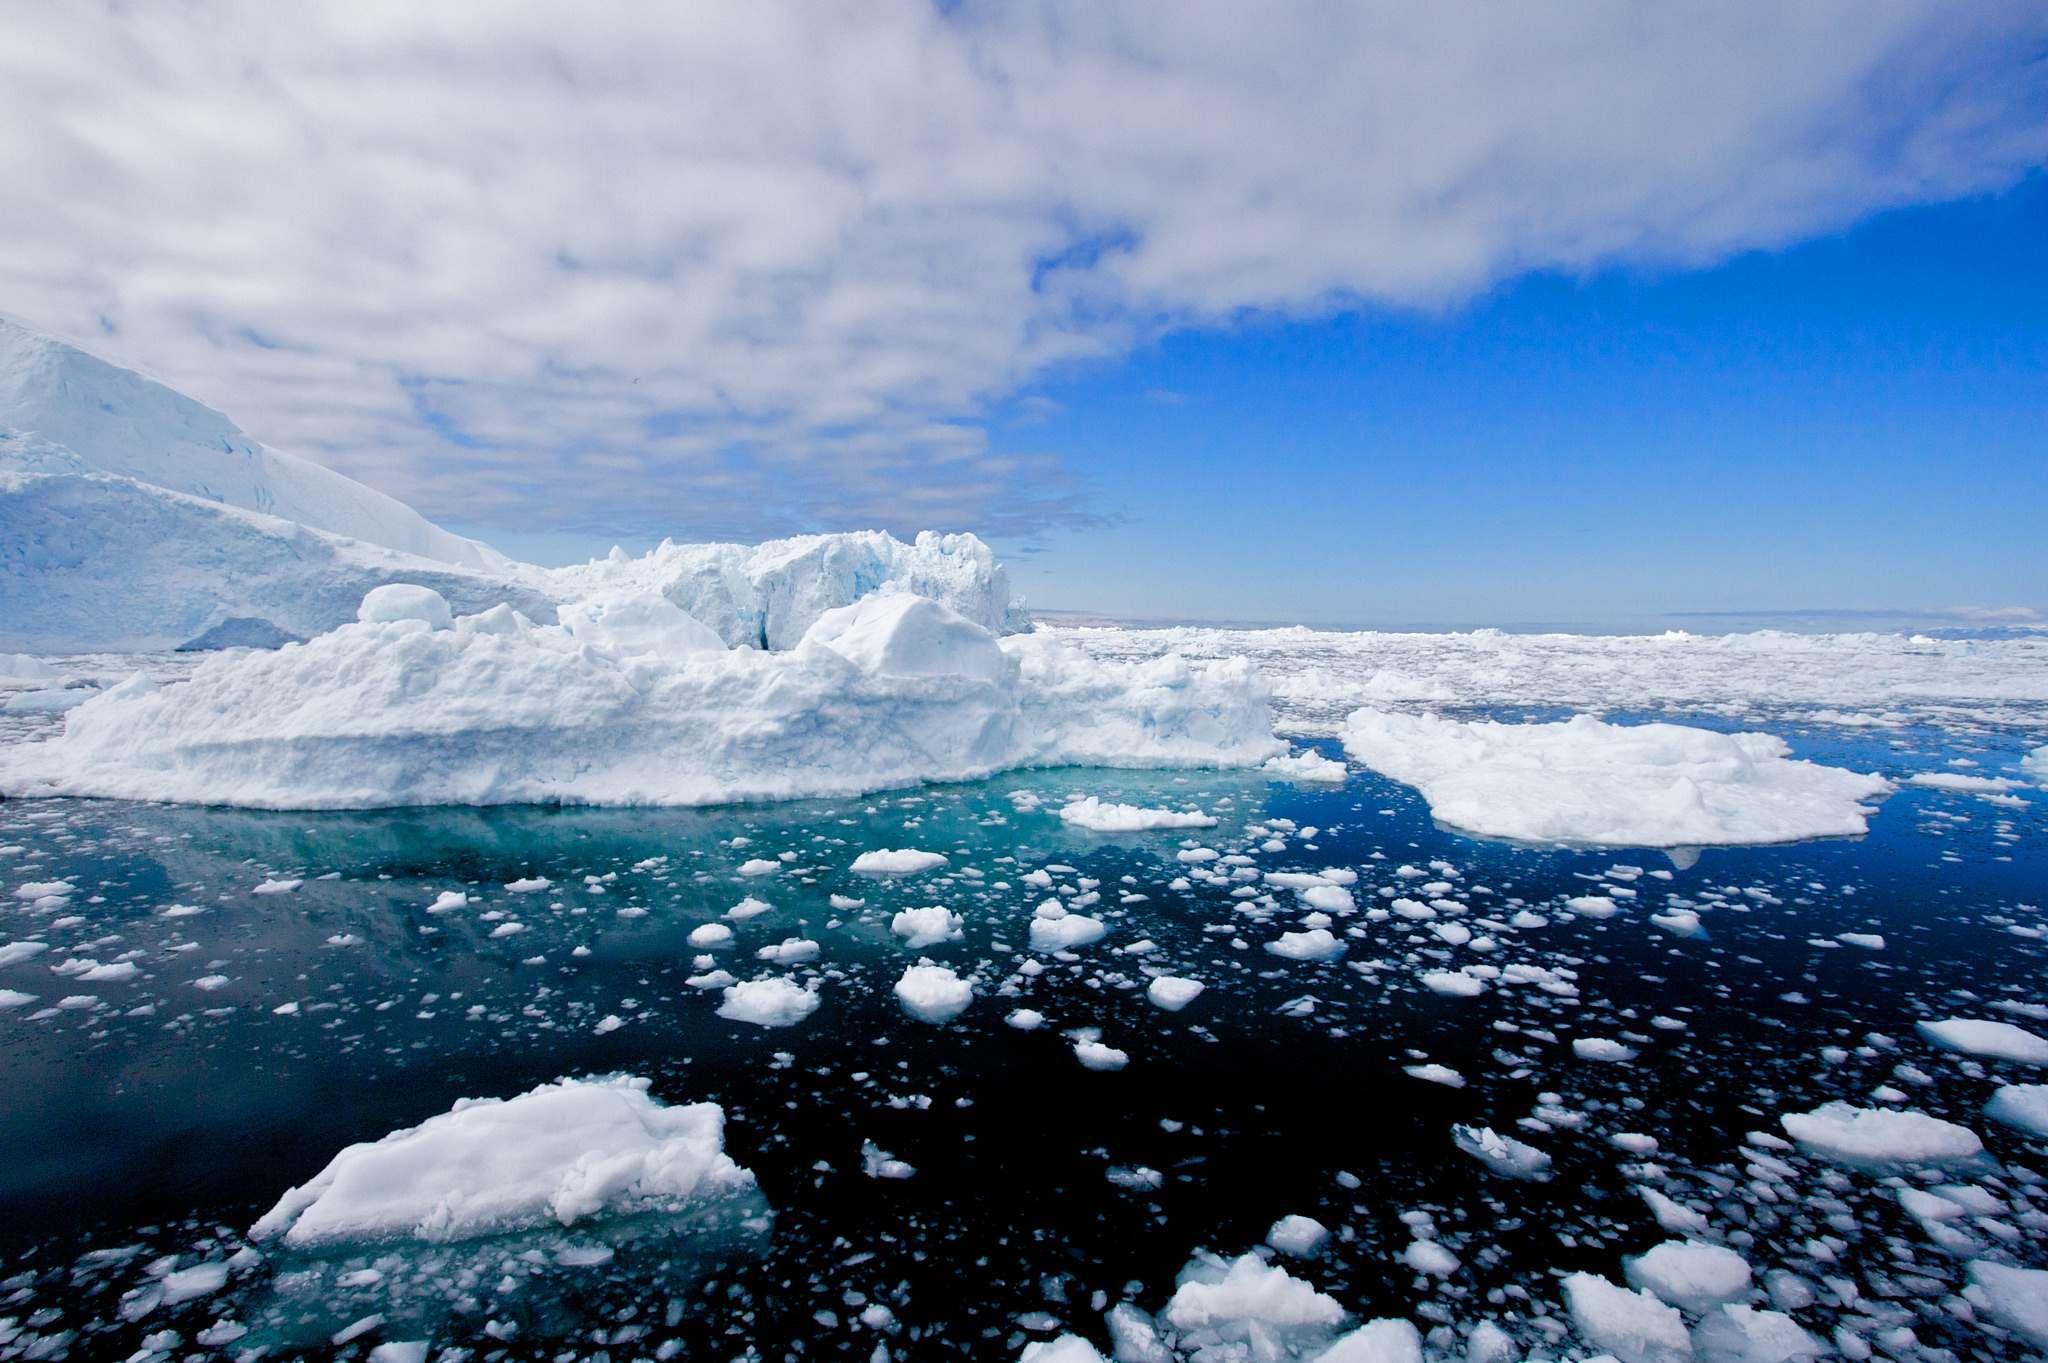 icefjord ilulissat1 The icefjord in Ilulissat, Greenland